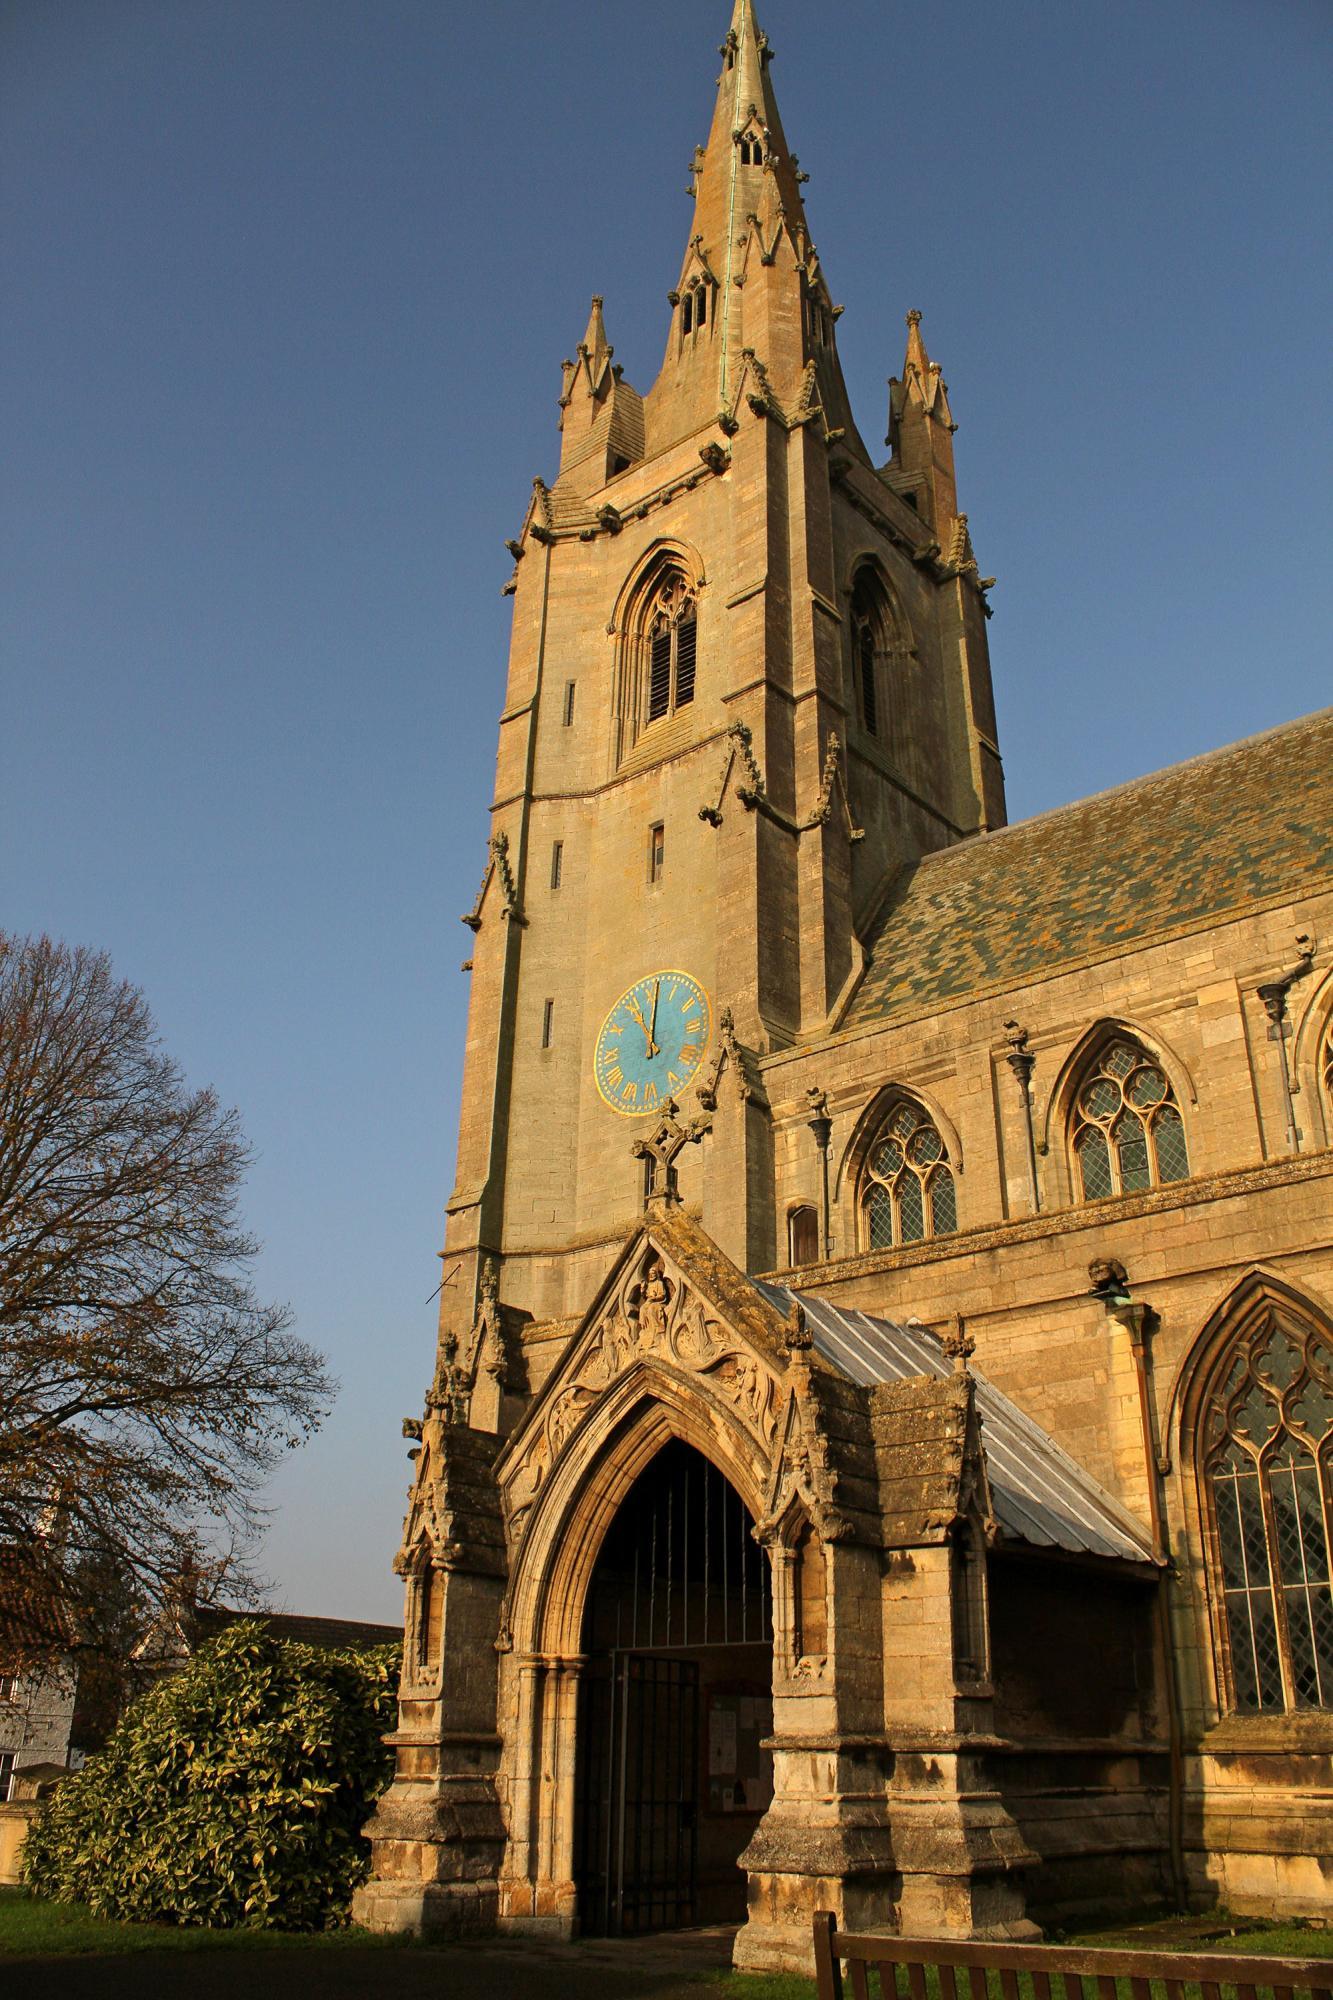 st Andrew's church, Heckington